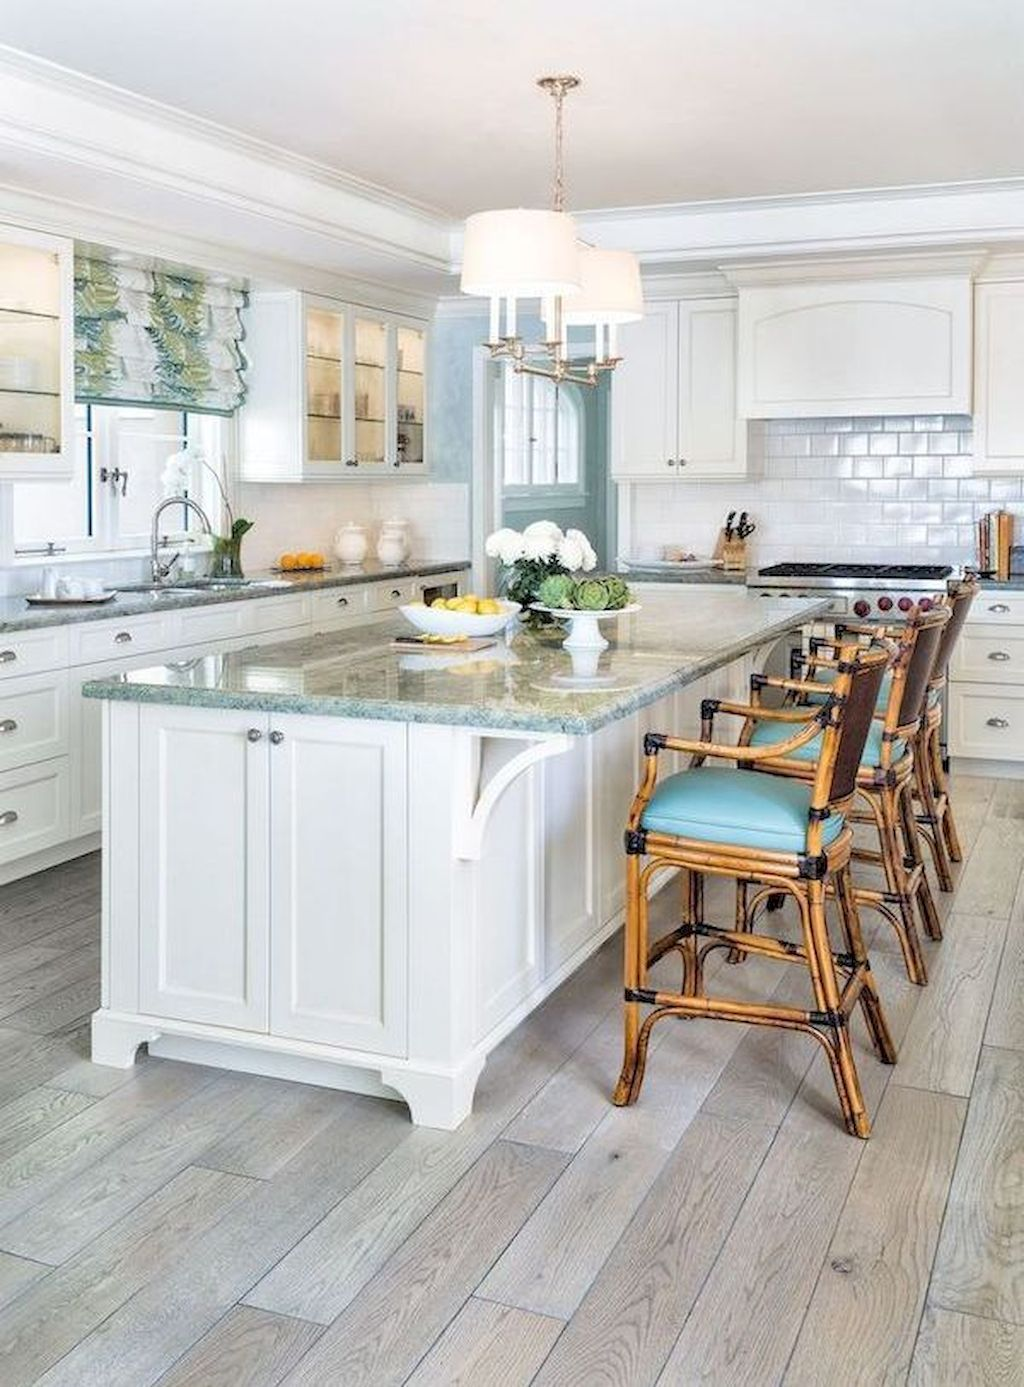 Cool 70 Tile Floor Farmhouse Kitchen Decor Ideas https